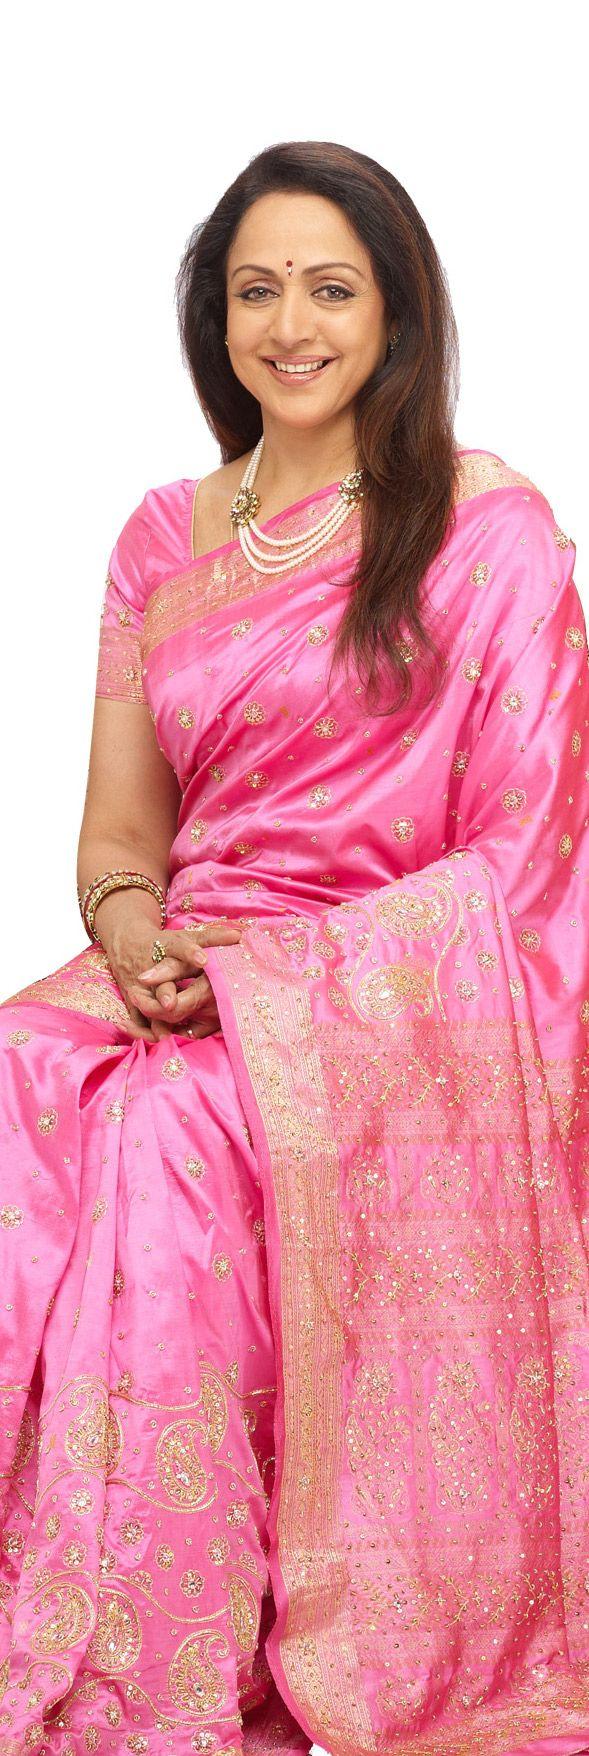 Hema Malini in Pothys silk - original pin by @webjournal